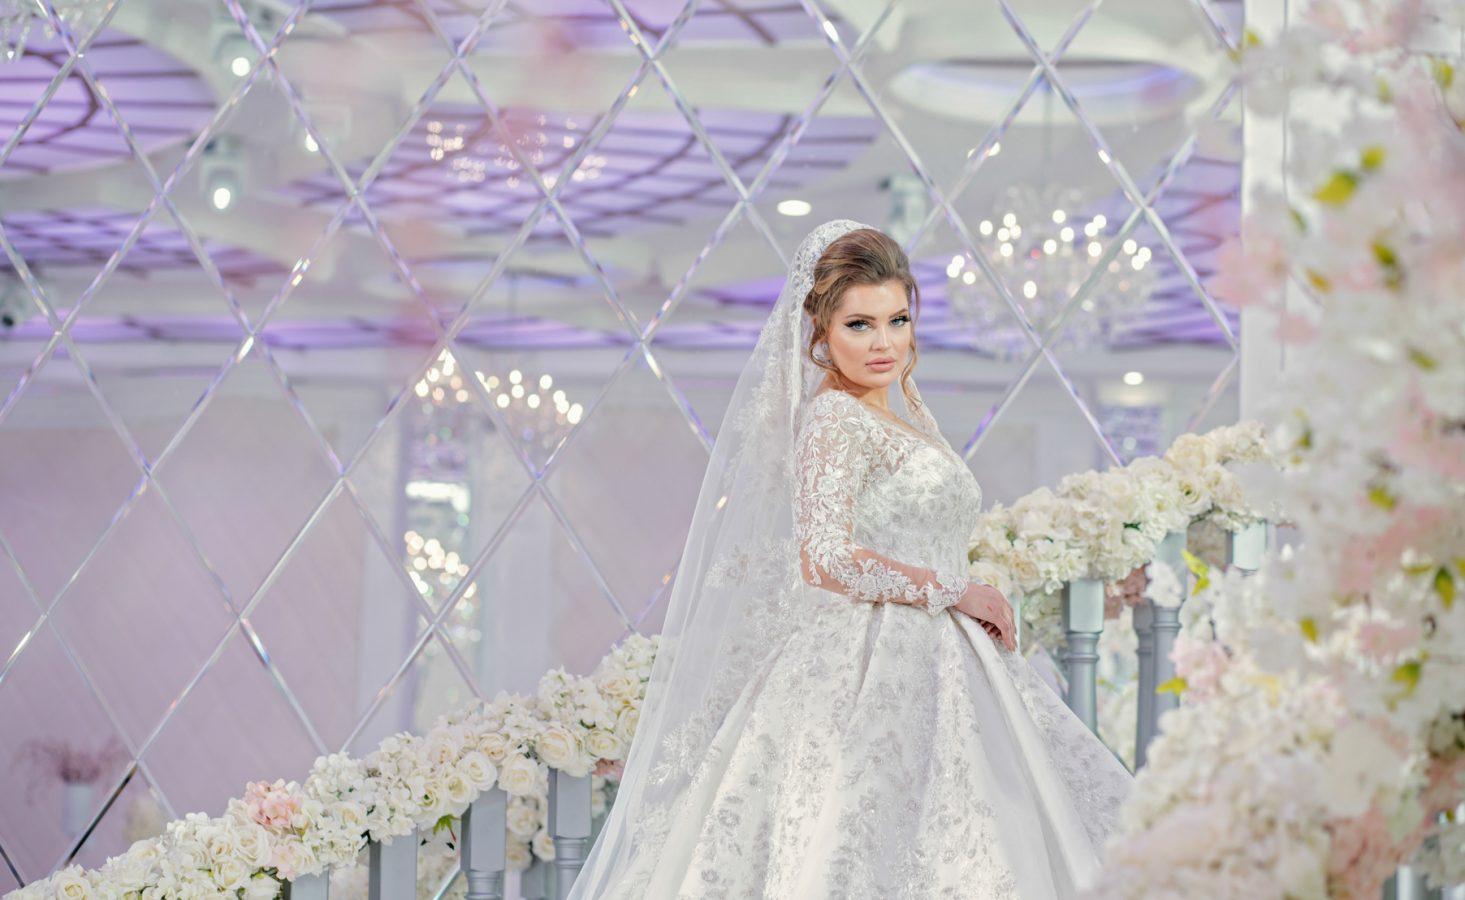 The-Bridal-Closet-Photo-by-Mediamem-12-of-50